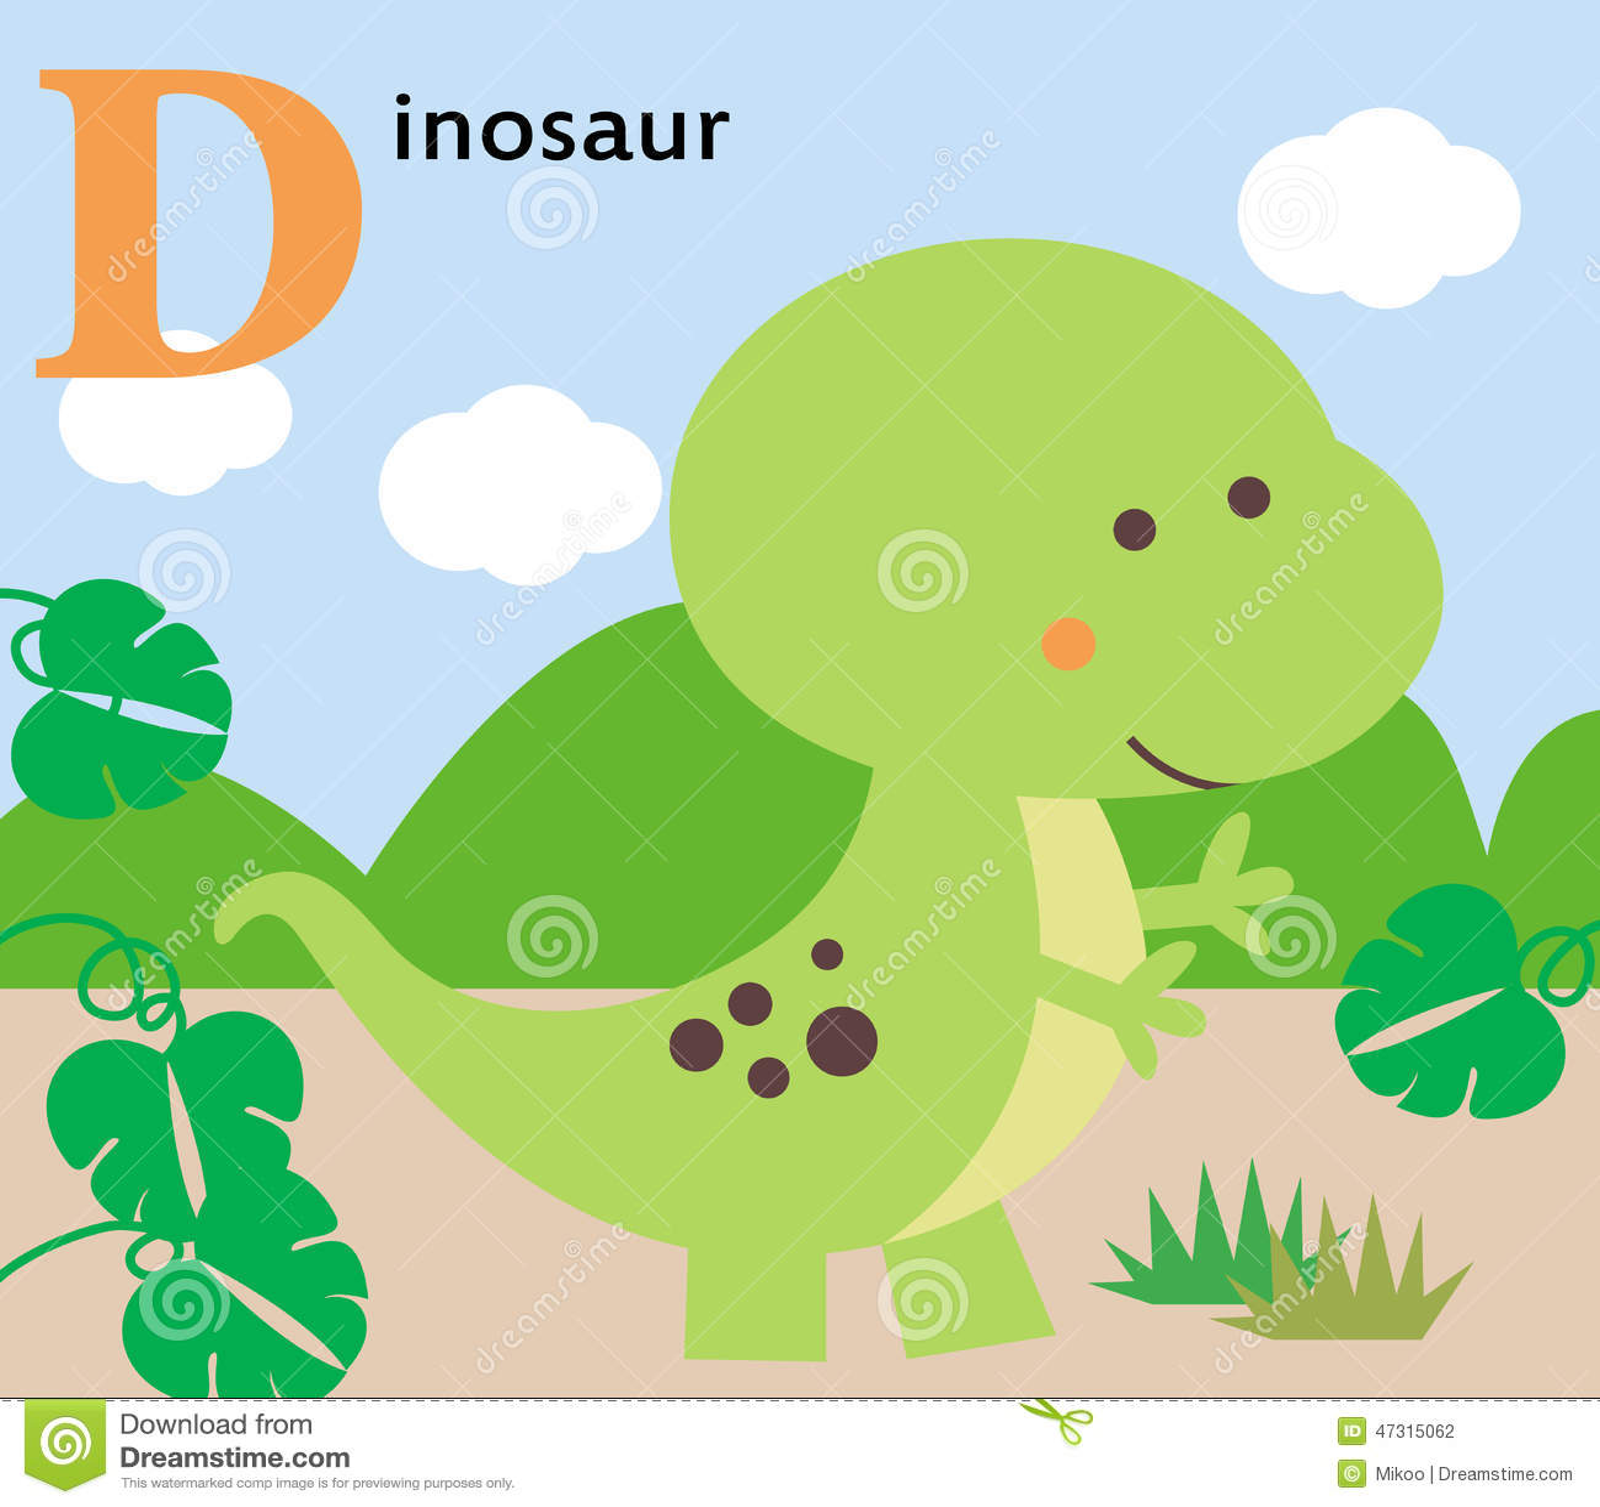 Animal Alphabet For The Kids: D For The Dinosaur Stock Vector ...